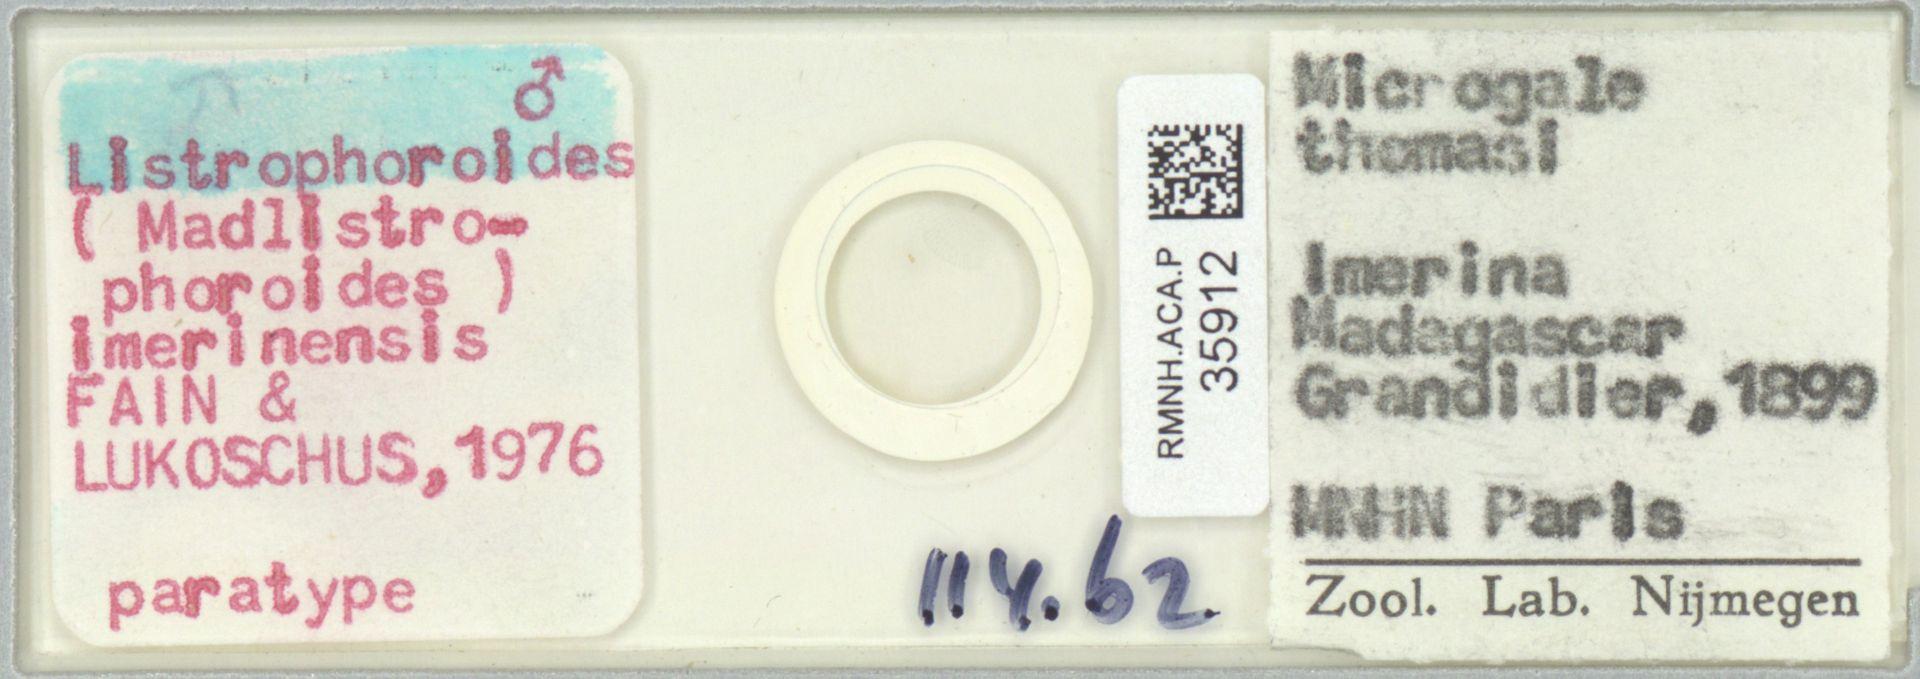 RMNH.ACA.P.35912 | Listrophoroides (Madlistrophoroides) imerinensis Fain & Lukoschus, 1976